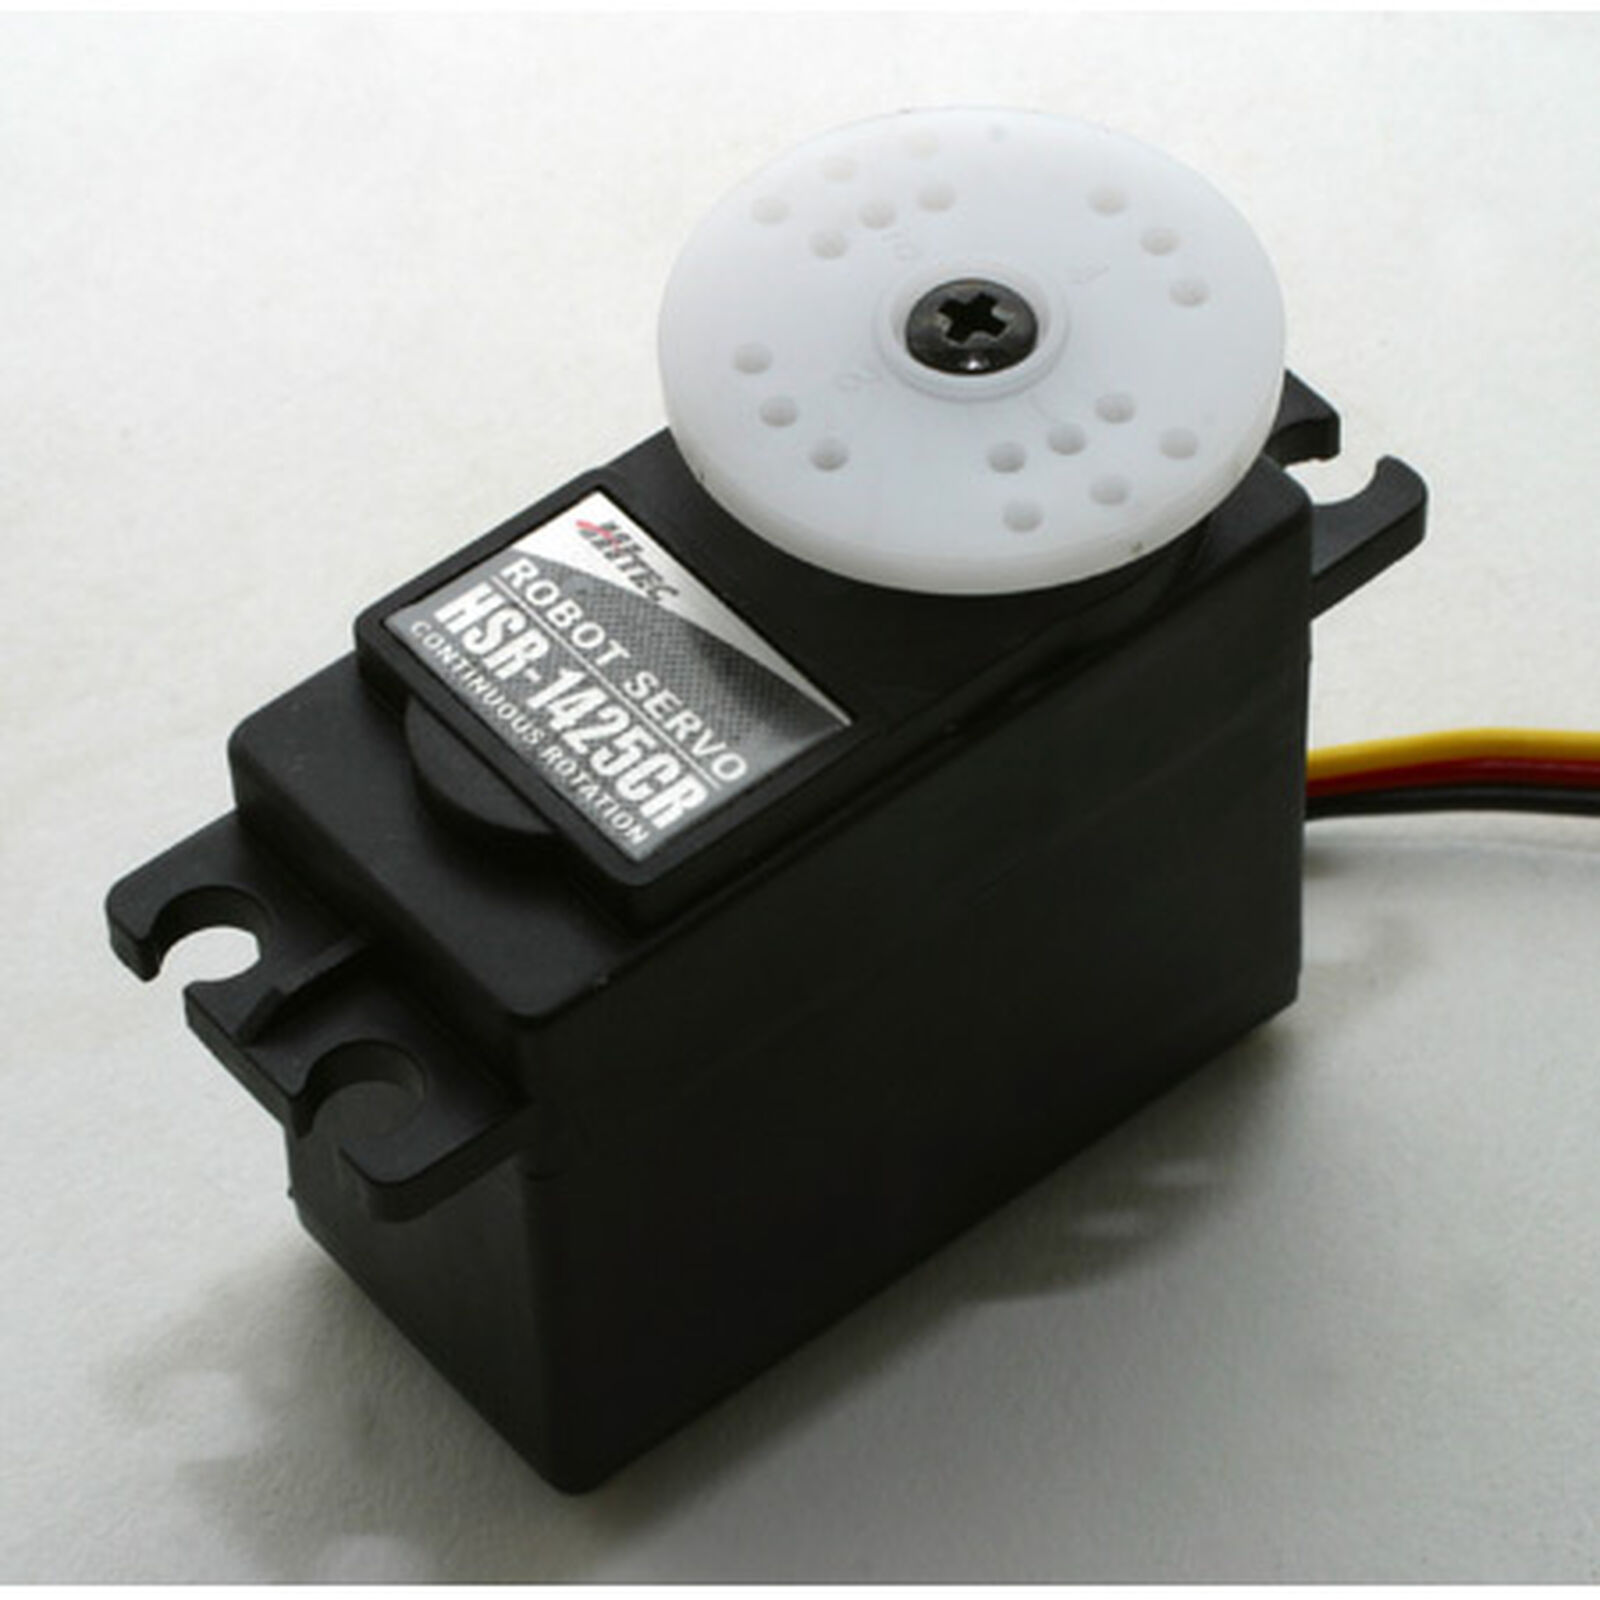 HS-1425 Standard Analog Continuous Rotation Robot Servo